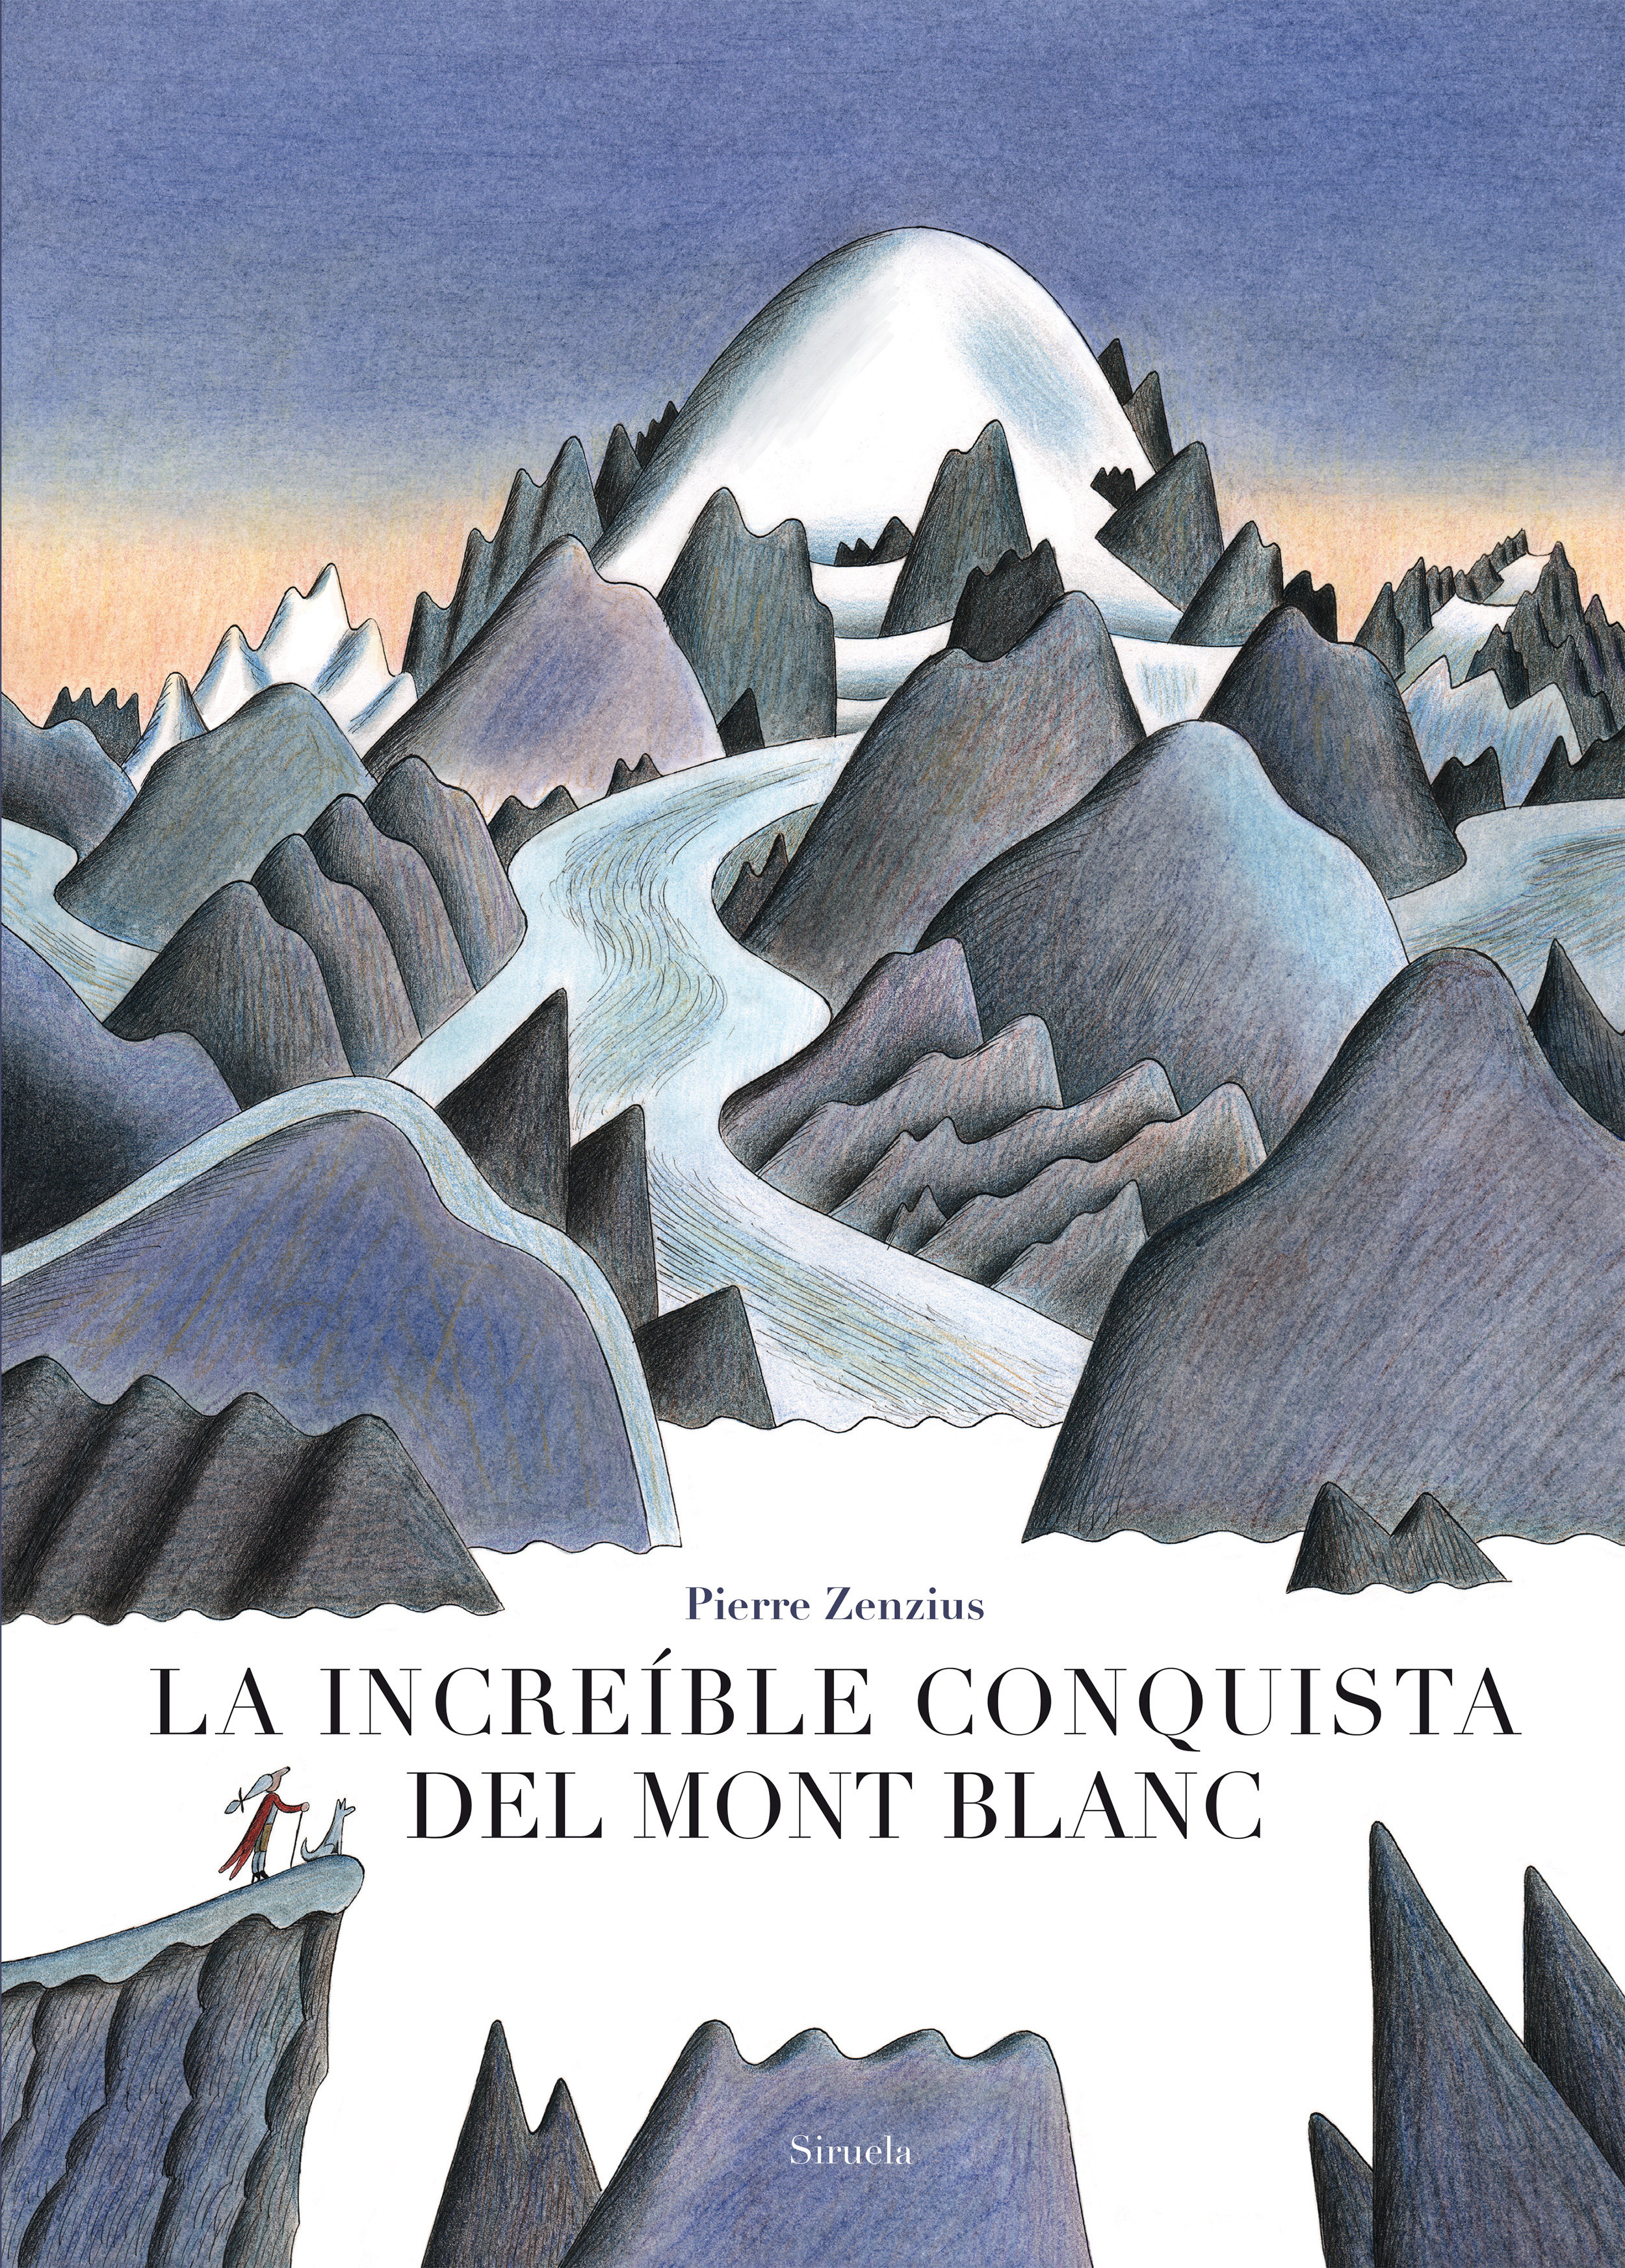 La Increible Conquista Del Mont Blanc por Pierre Zenzius